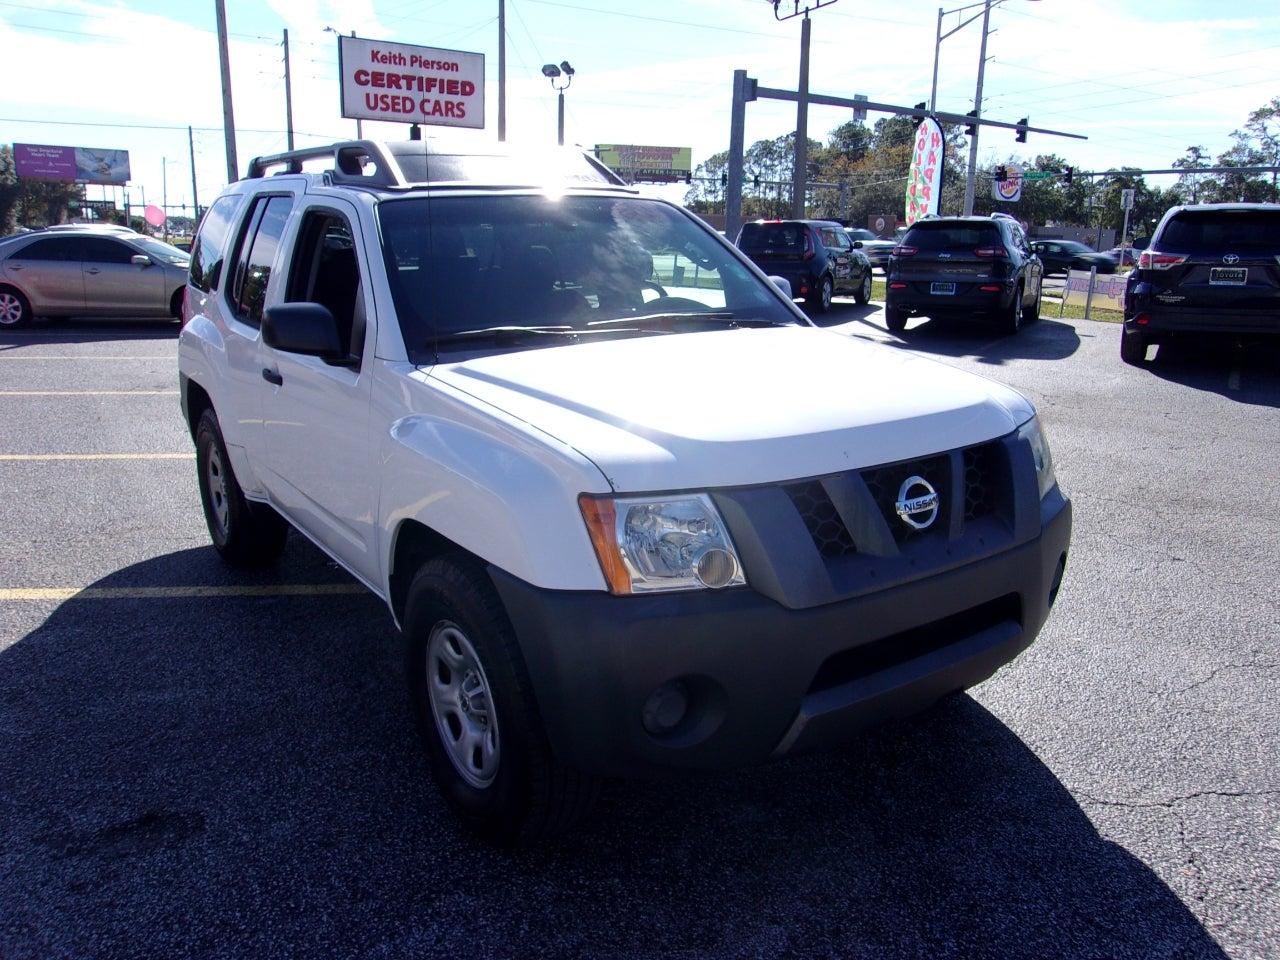 2008 Nissan Xterra S in Jacksonville, FL - Keith Pierson Toyota